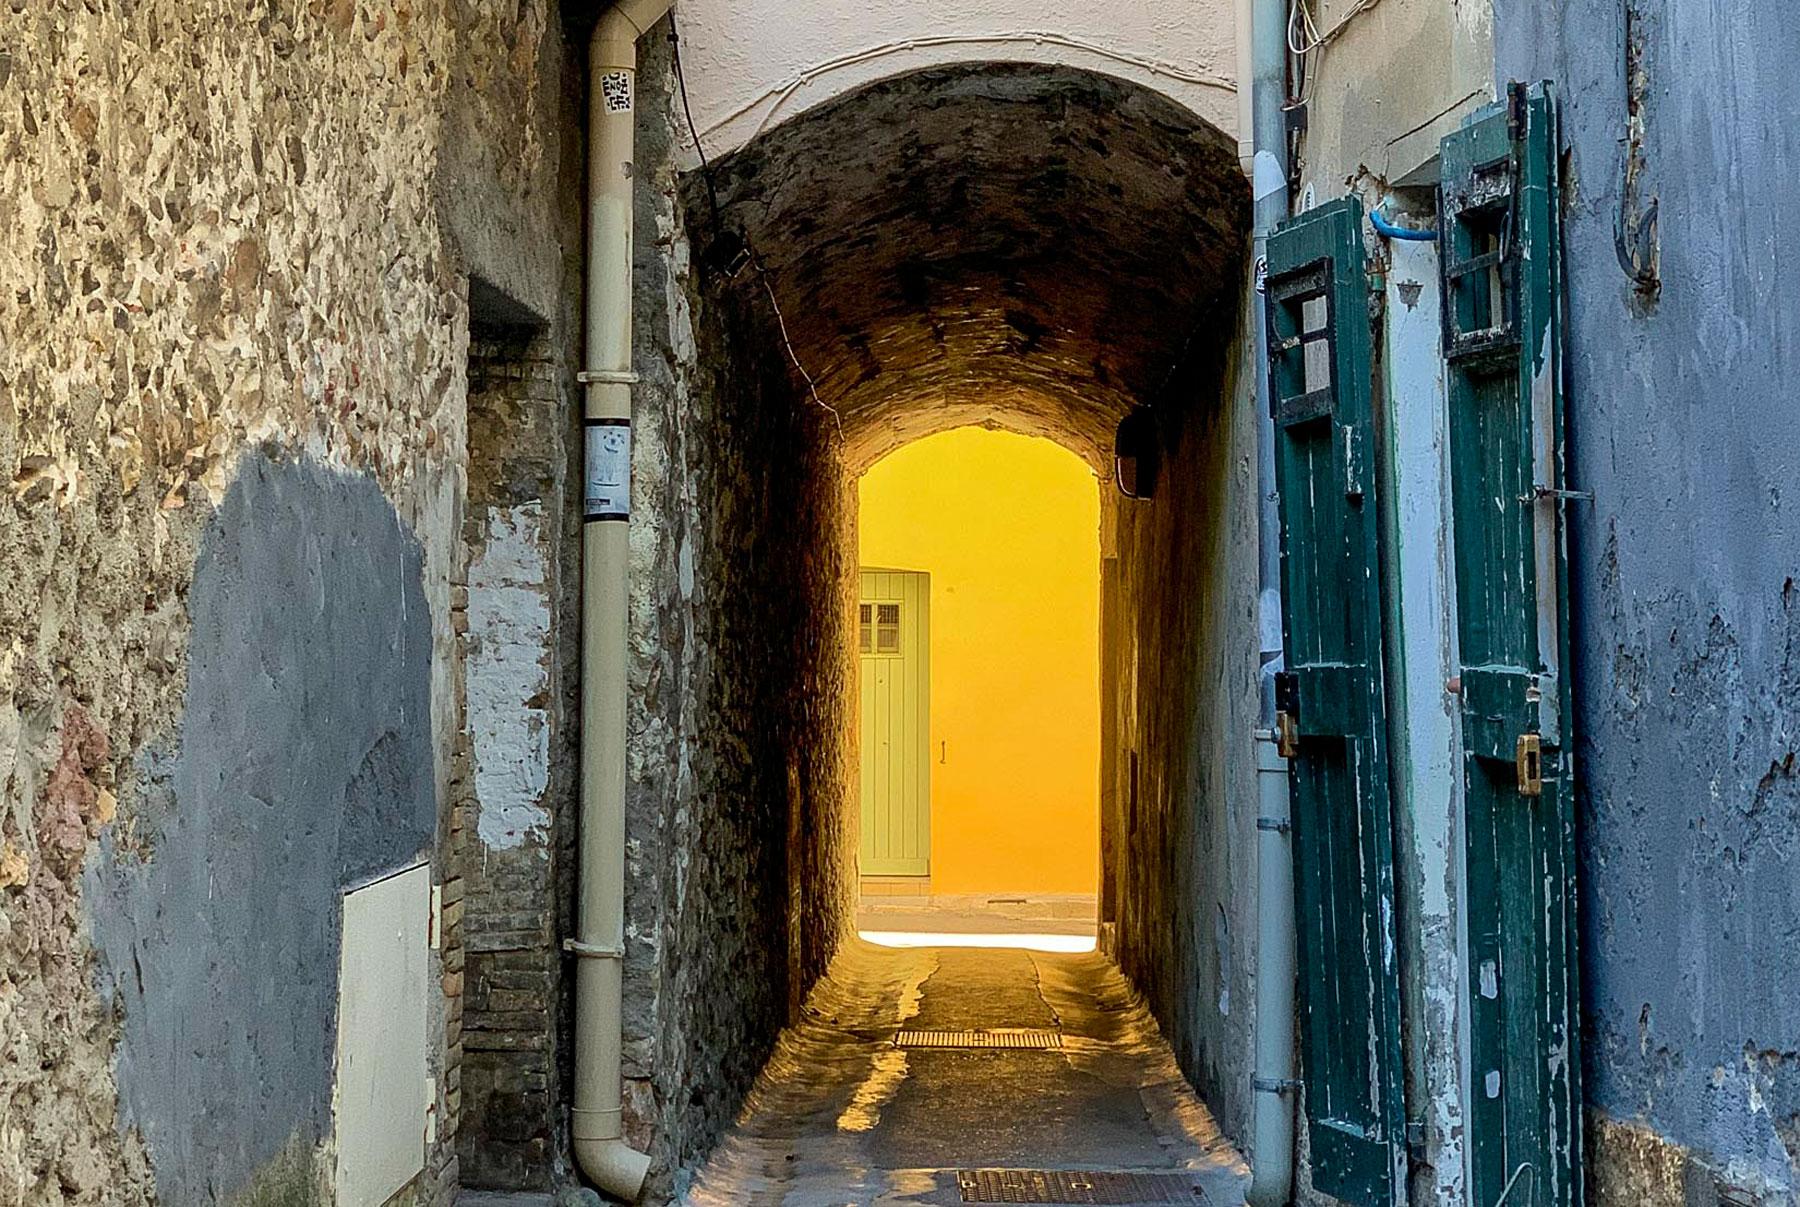 vieille ville - antibes france